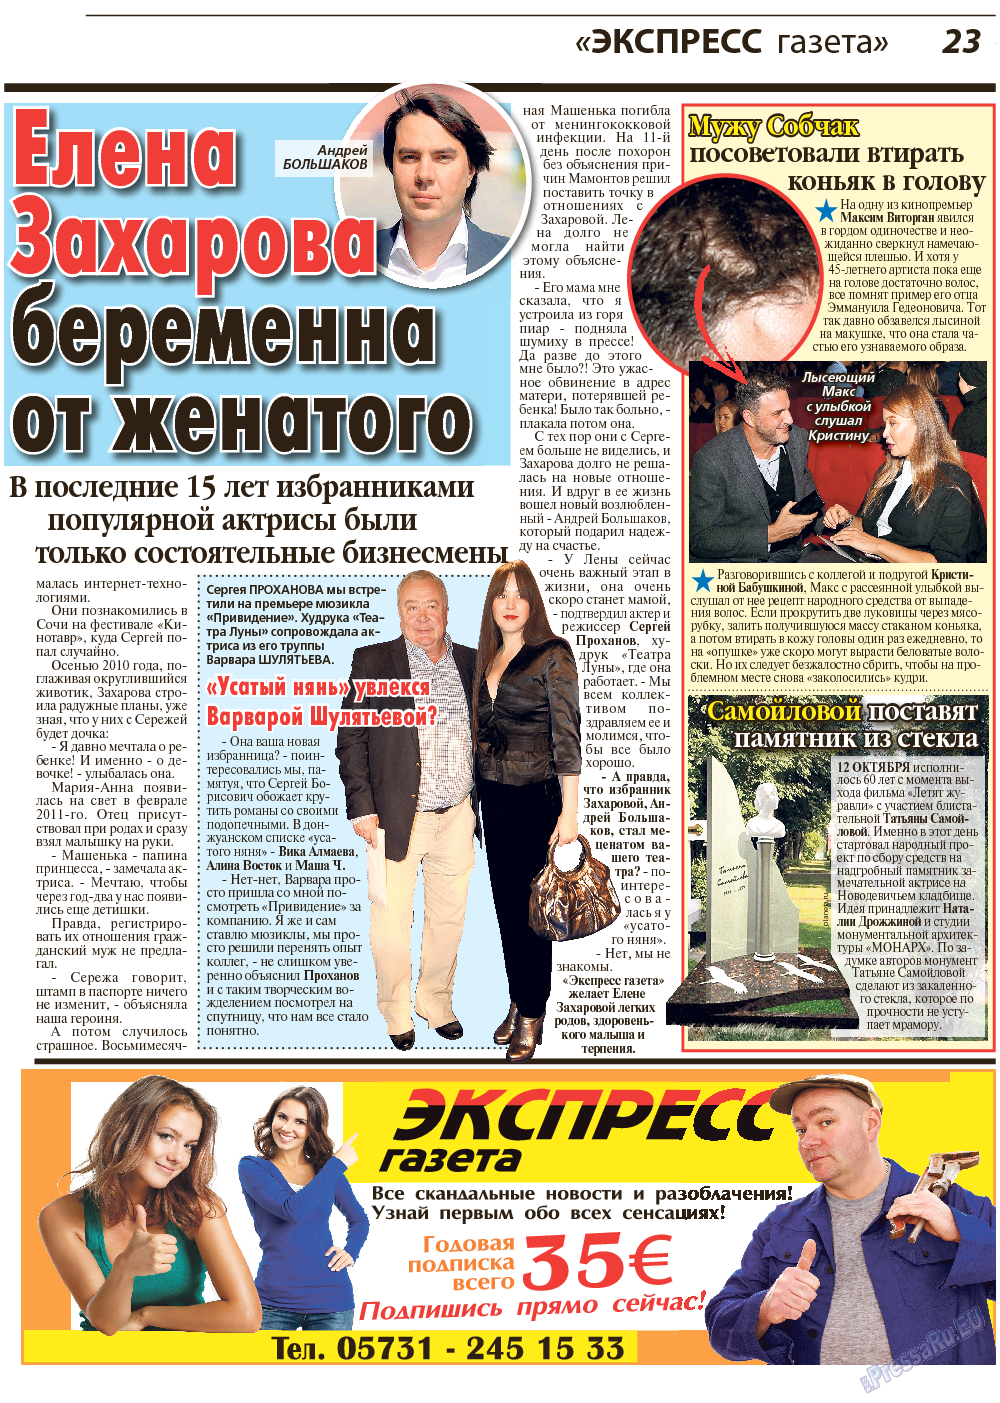 Экспресс газета (газета). 2017 год, номер 11, стр. 23